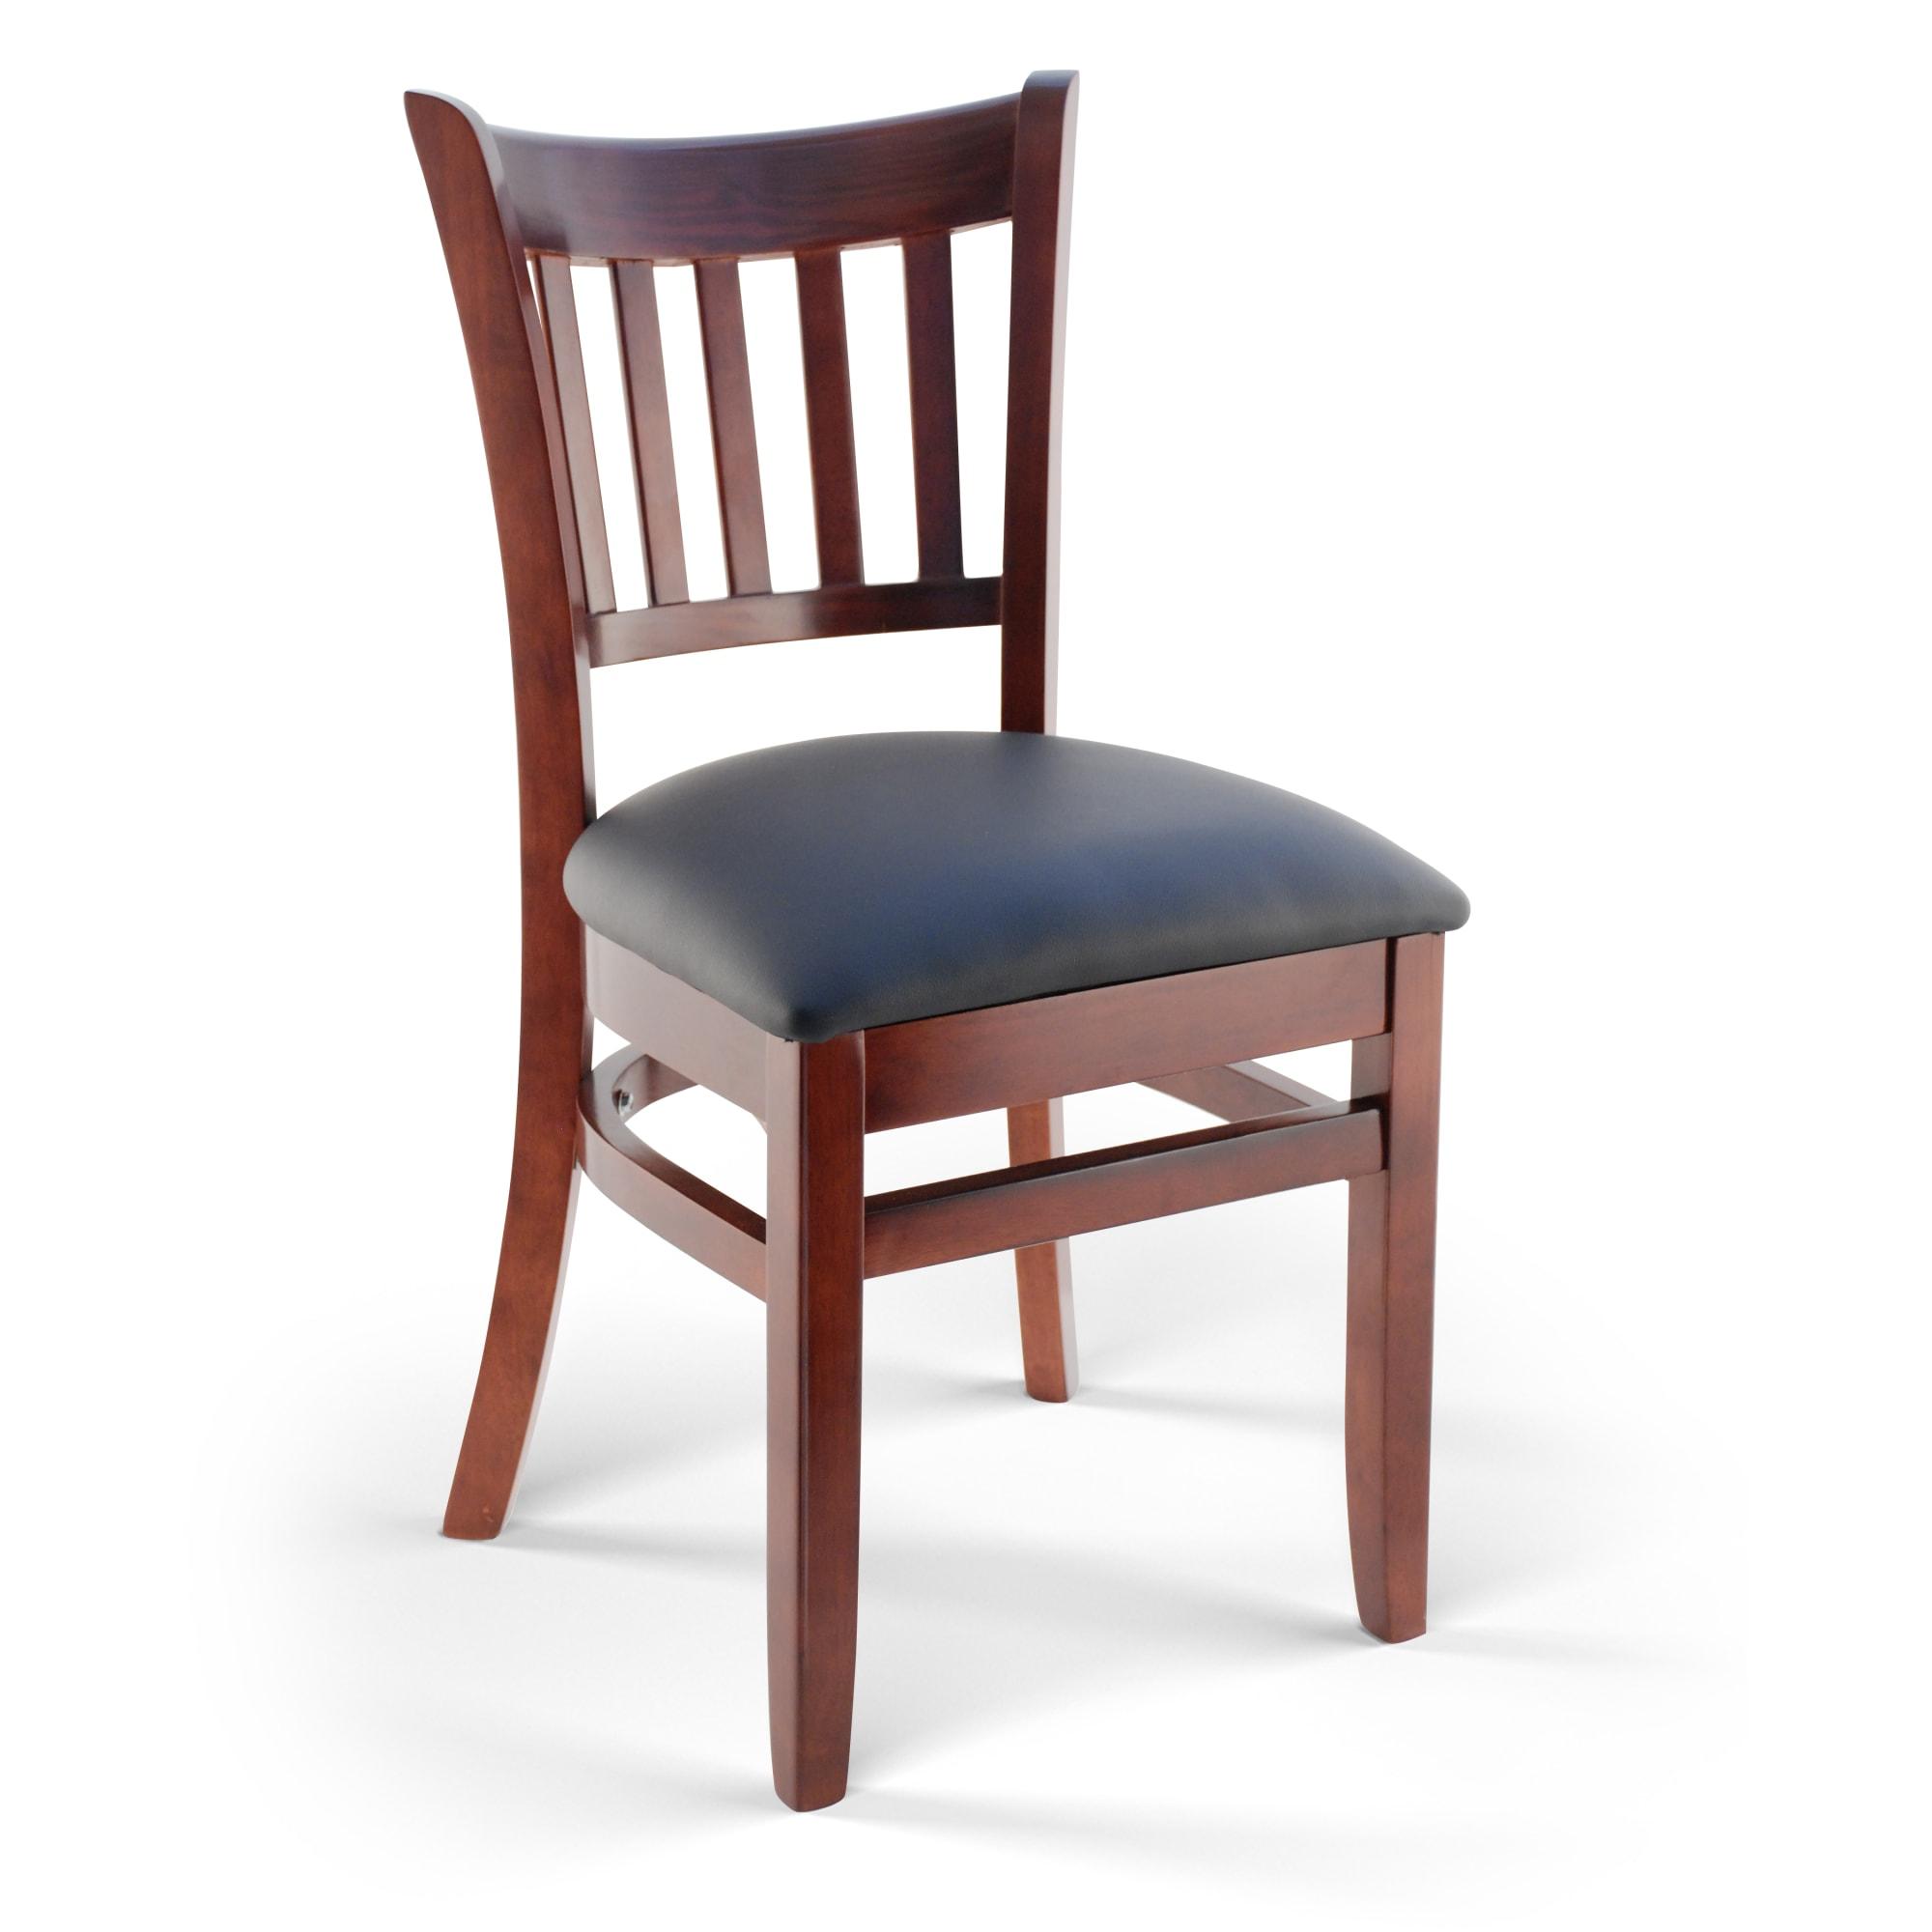 Premium US Made Vertical Slat Wood Chair